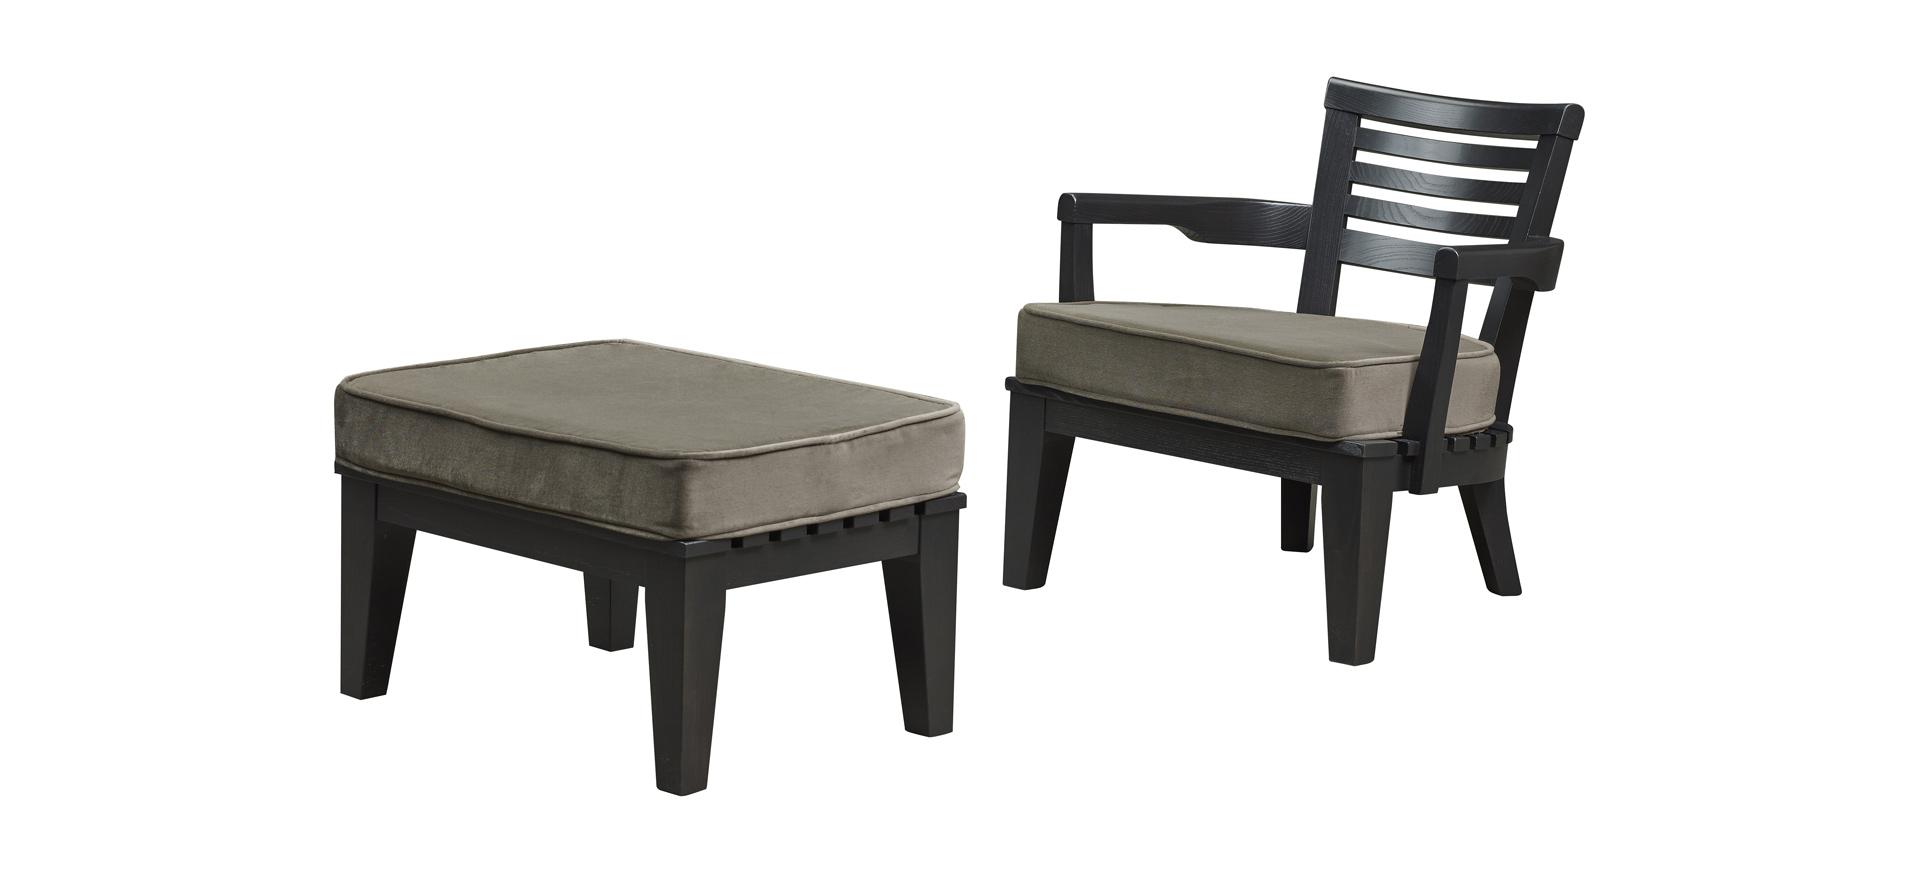 Varenna木质户外扶手椅配有织物或皮革软垫,请参见Promemoria户外系列产品目录|Promemoria